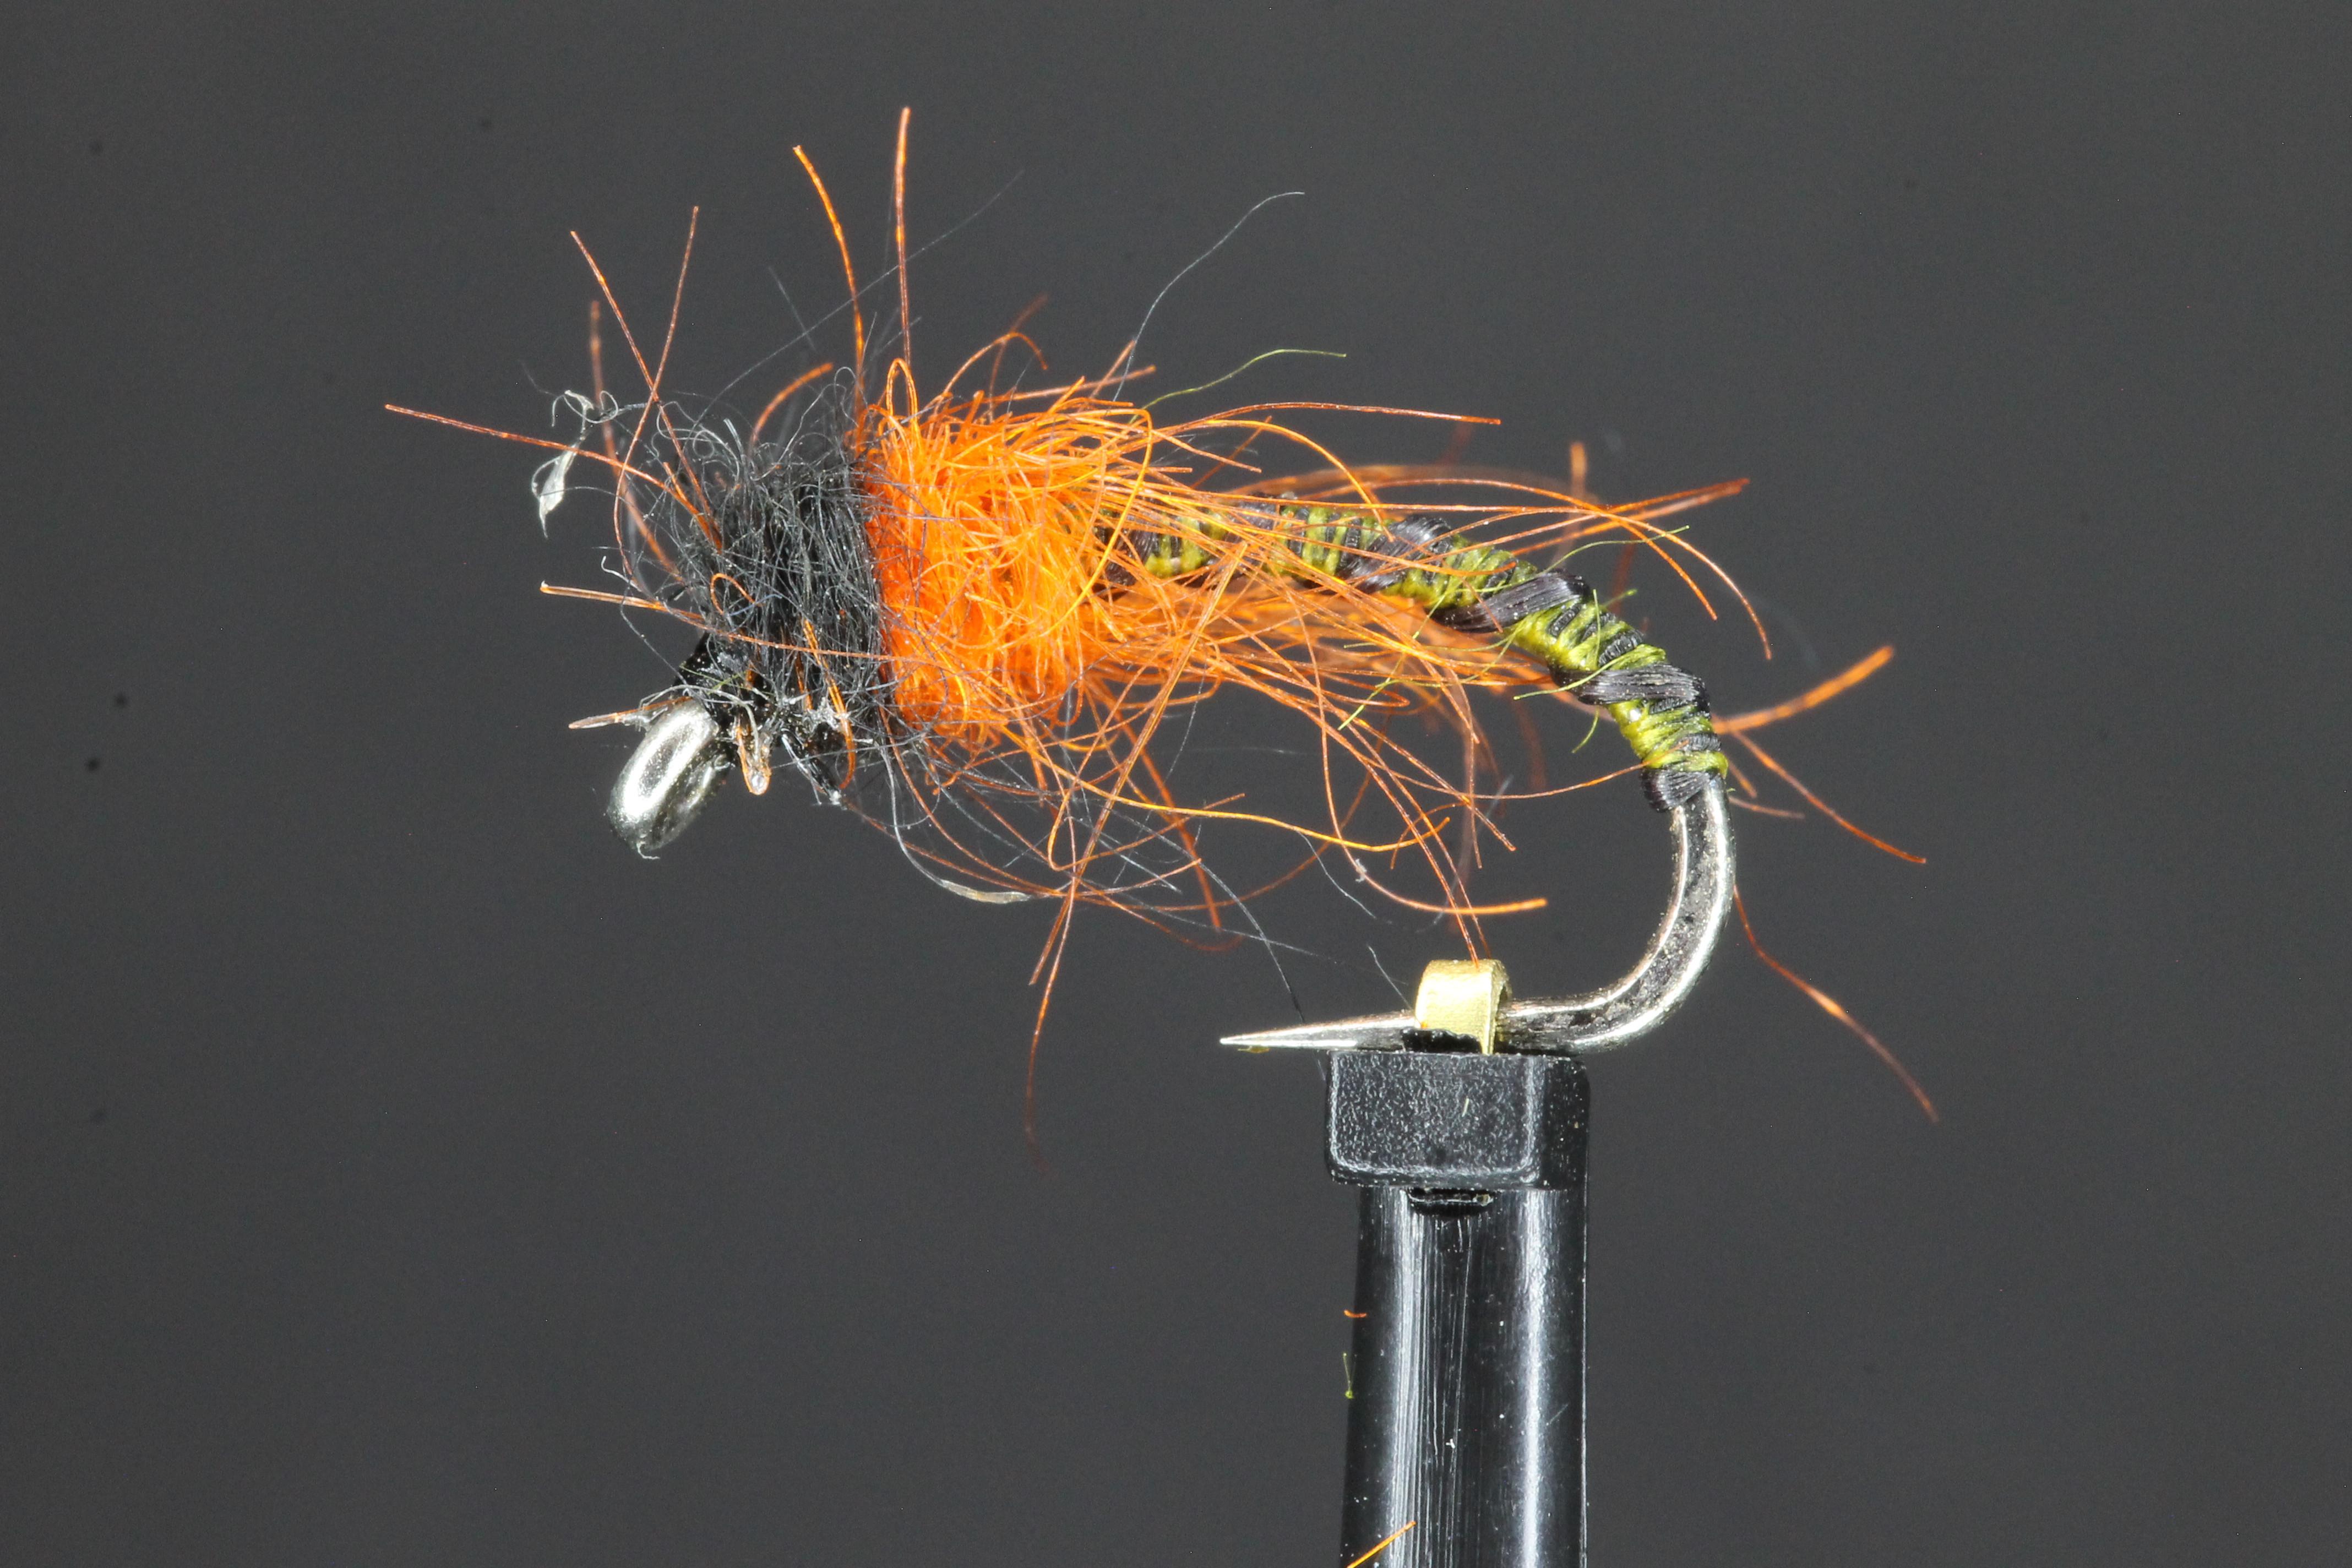 Olive Black Buzzer Orange Head